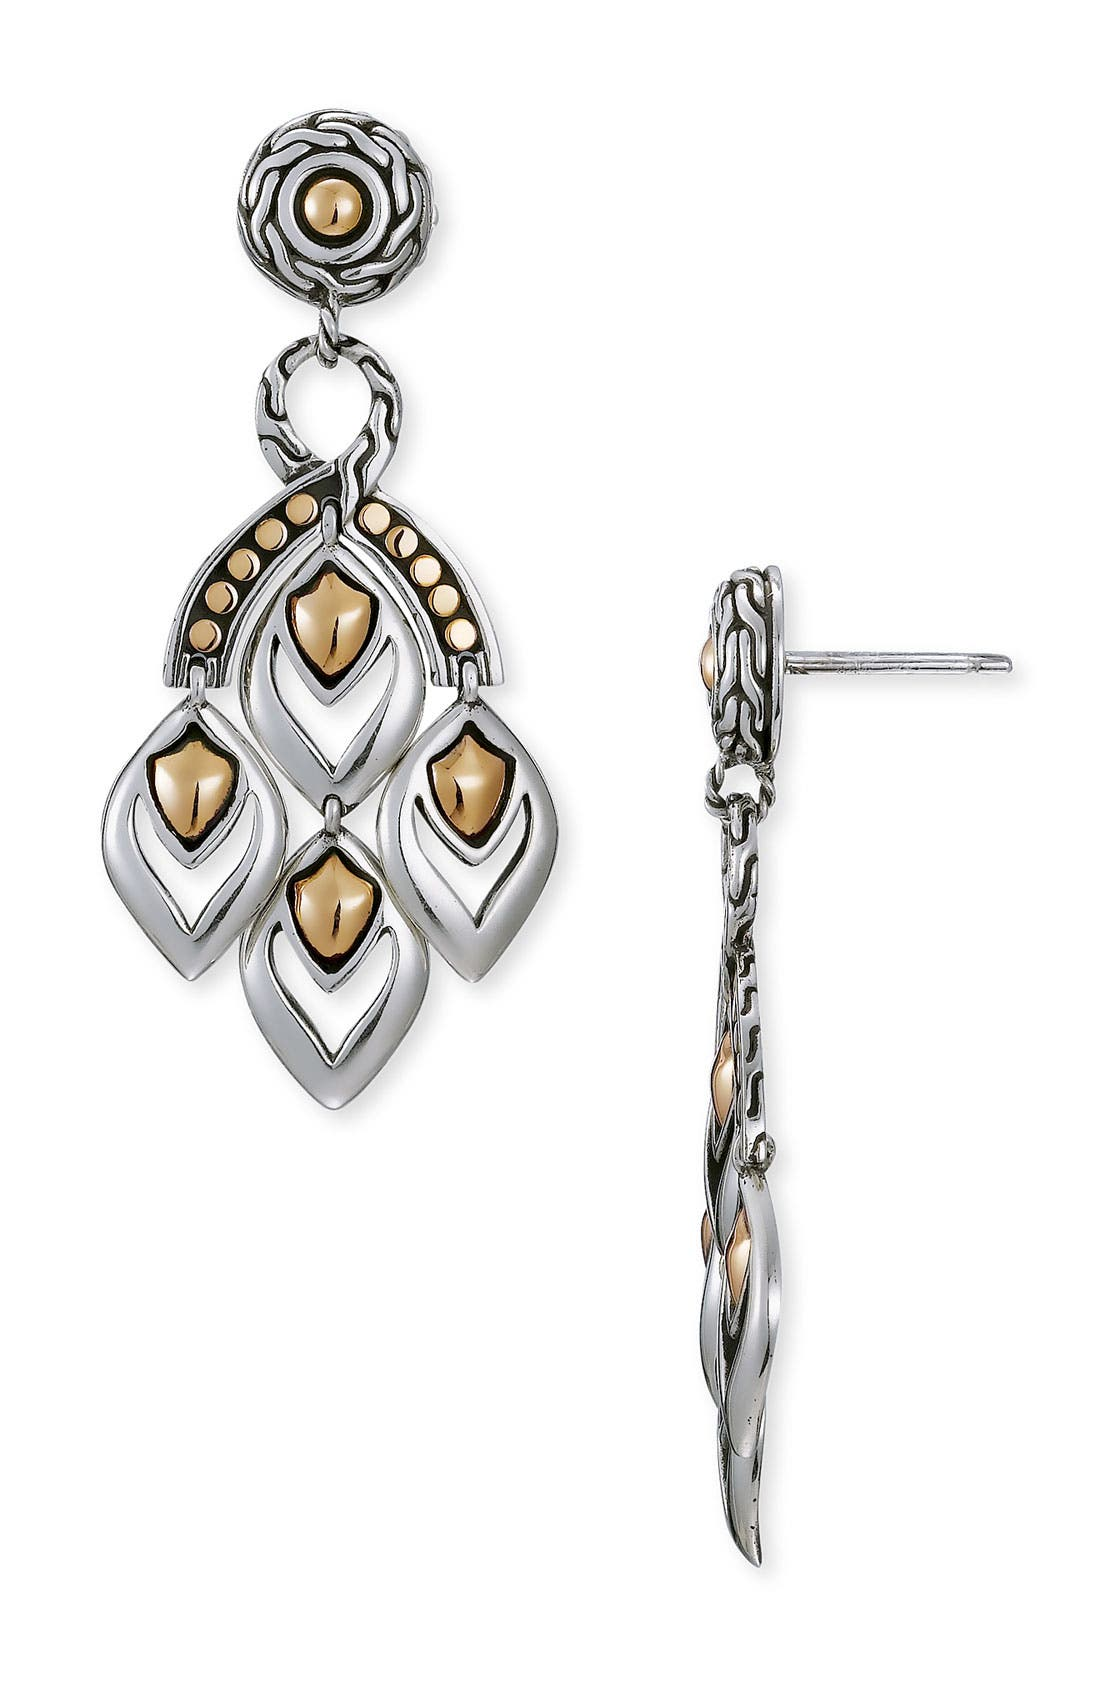 Main Image - John Hardy 'Naga' Mini Chandelier Earrings